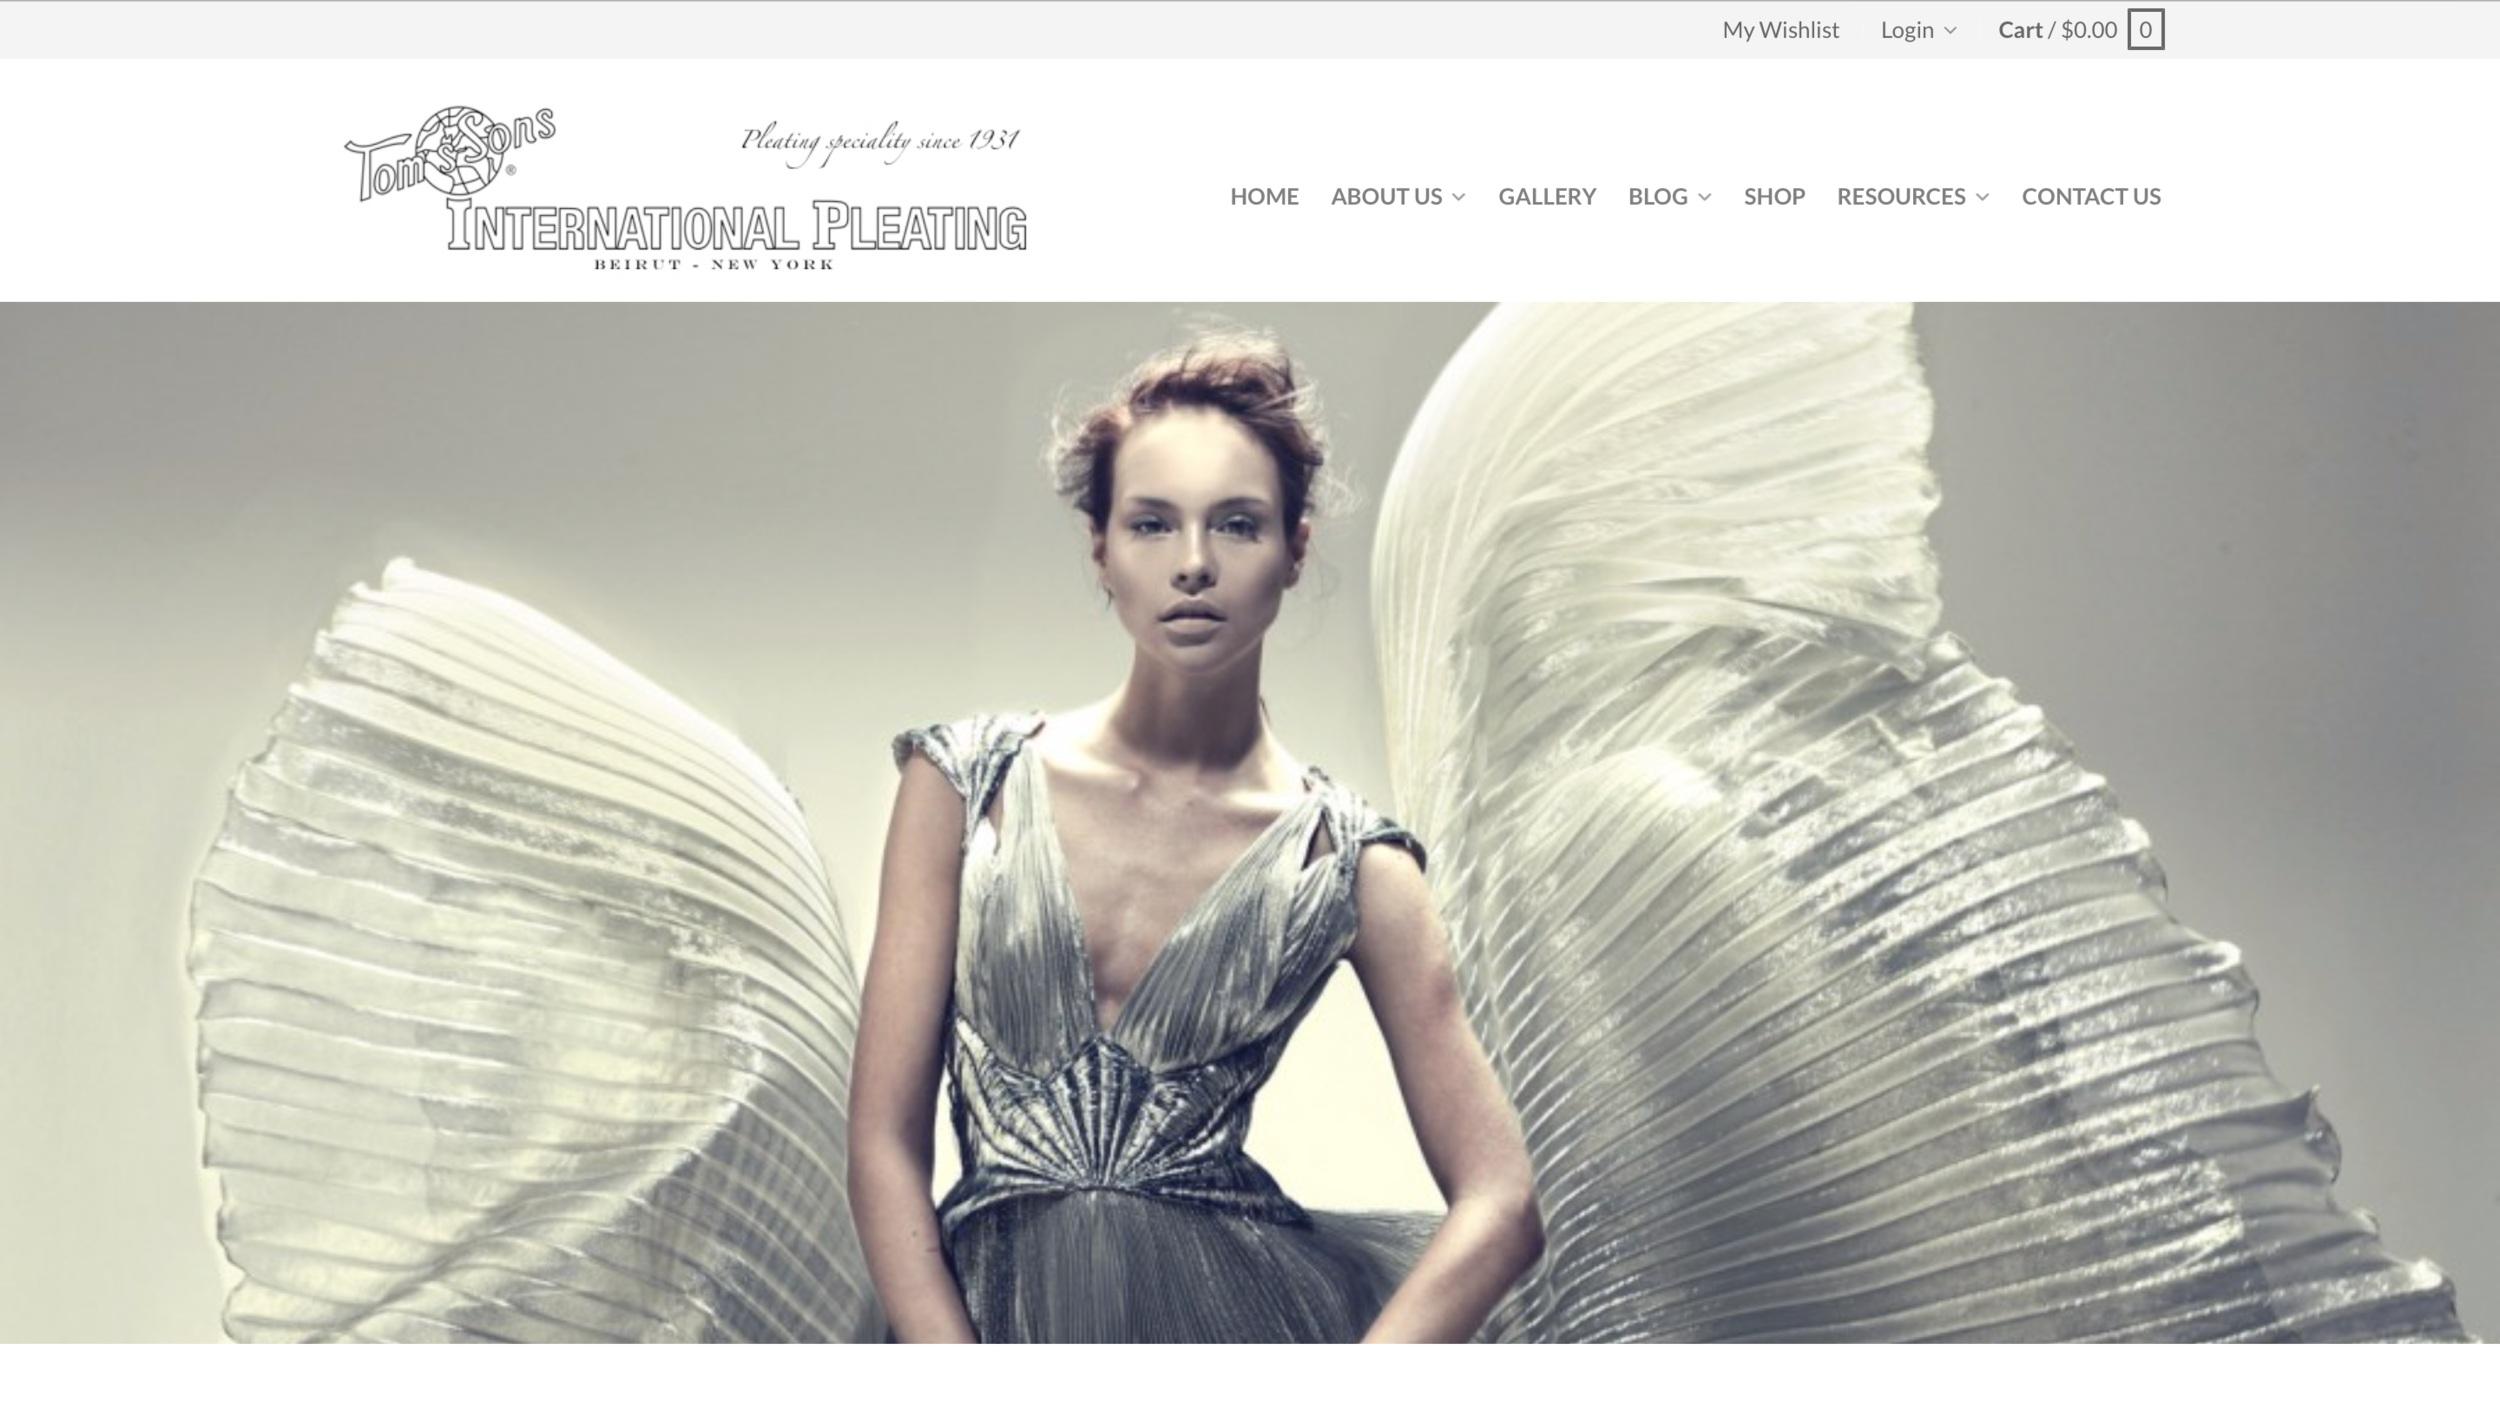 Small business marketing for wedding and fashion industries. International Pleating https://www.internationalpleating.com